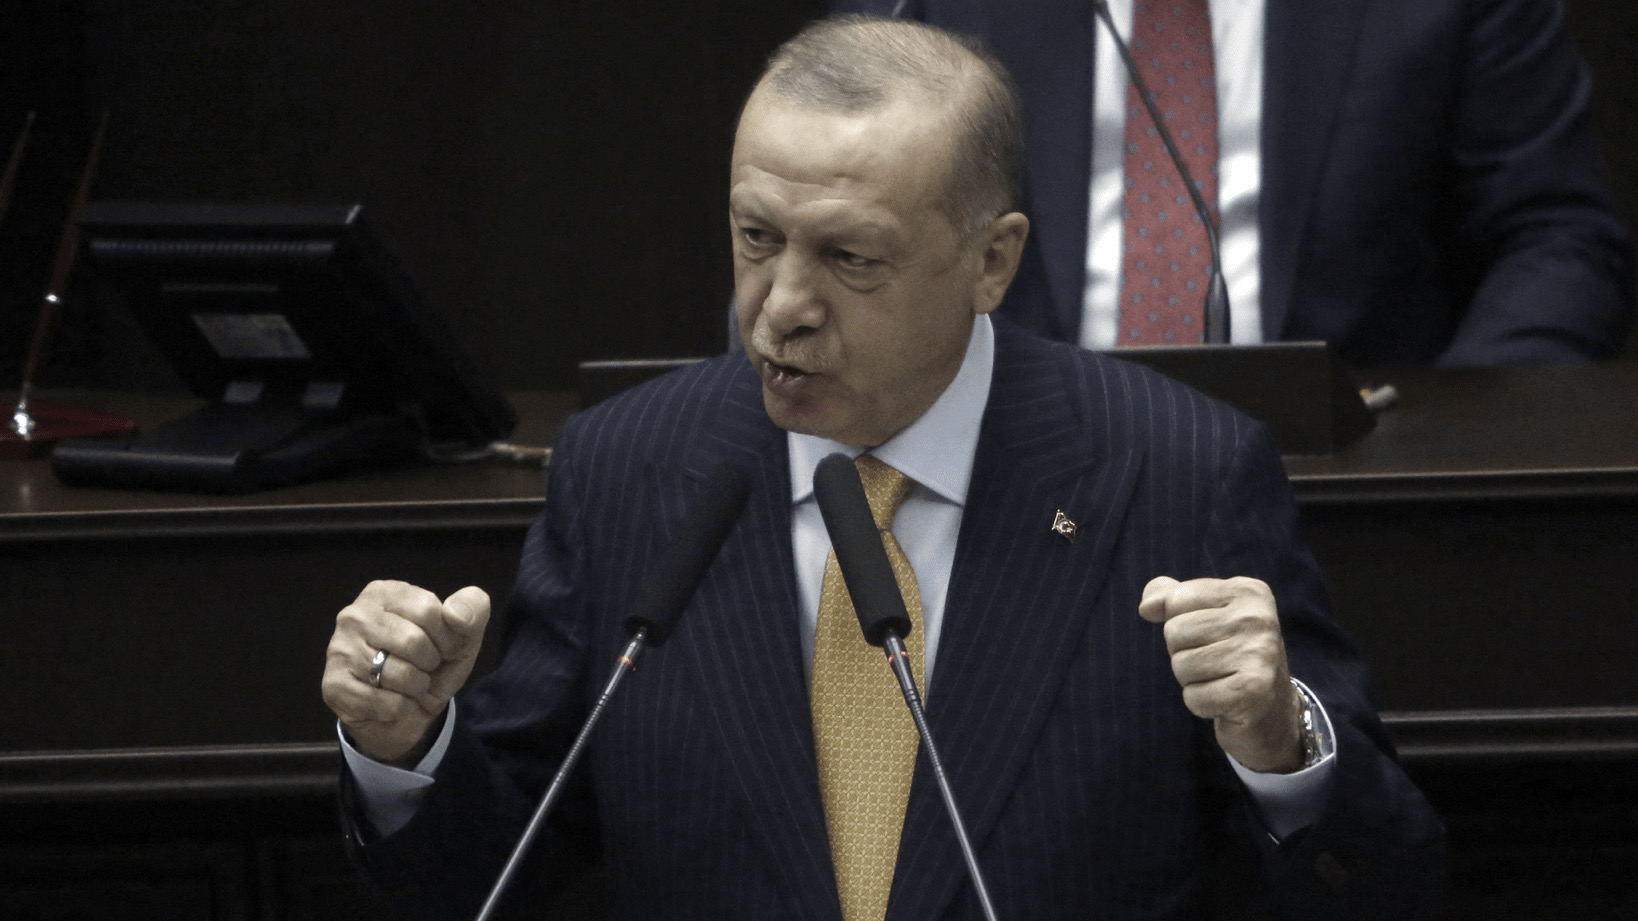 Erdogan as the new godfather of Islamic fascism